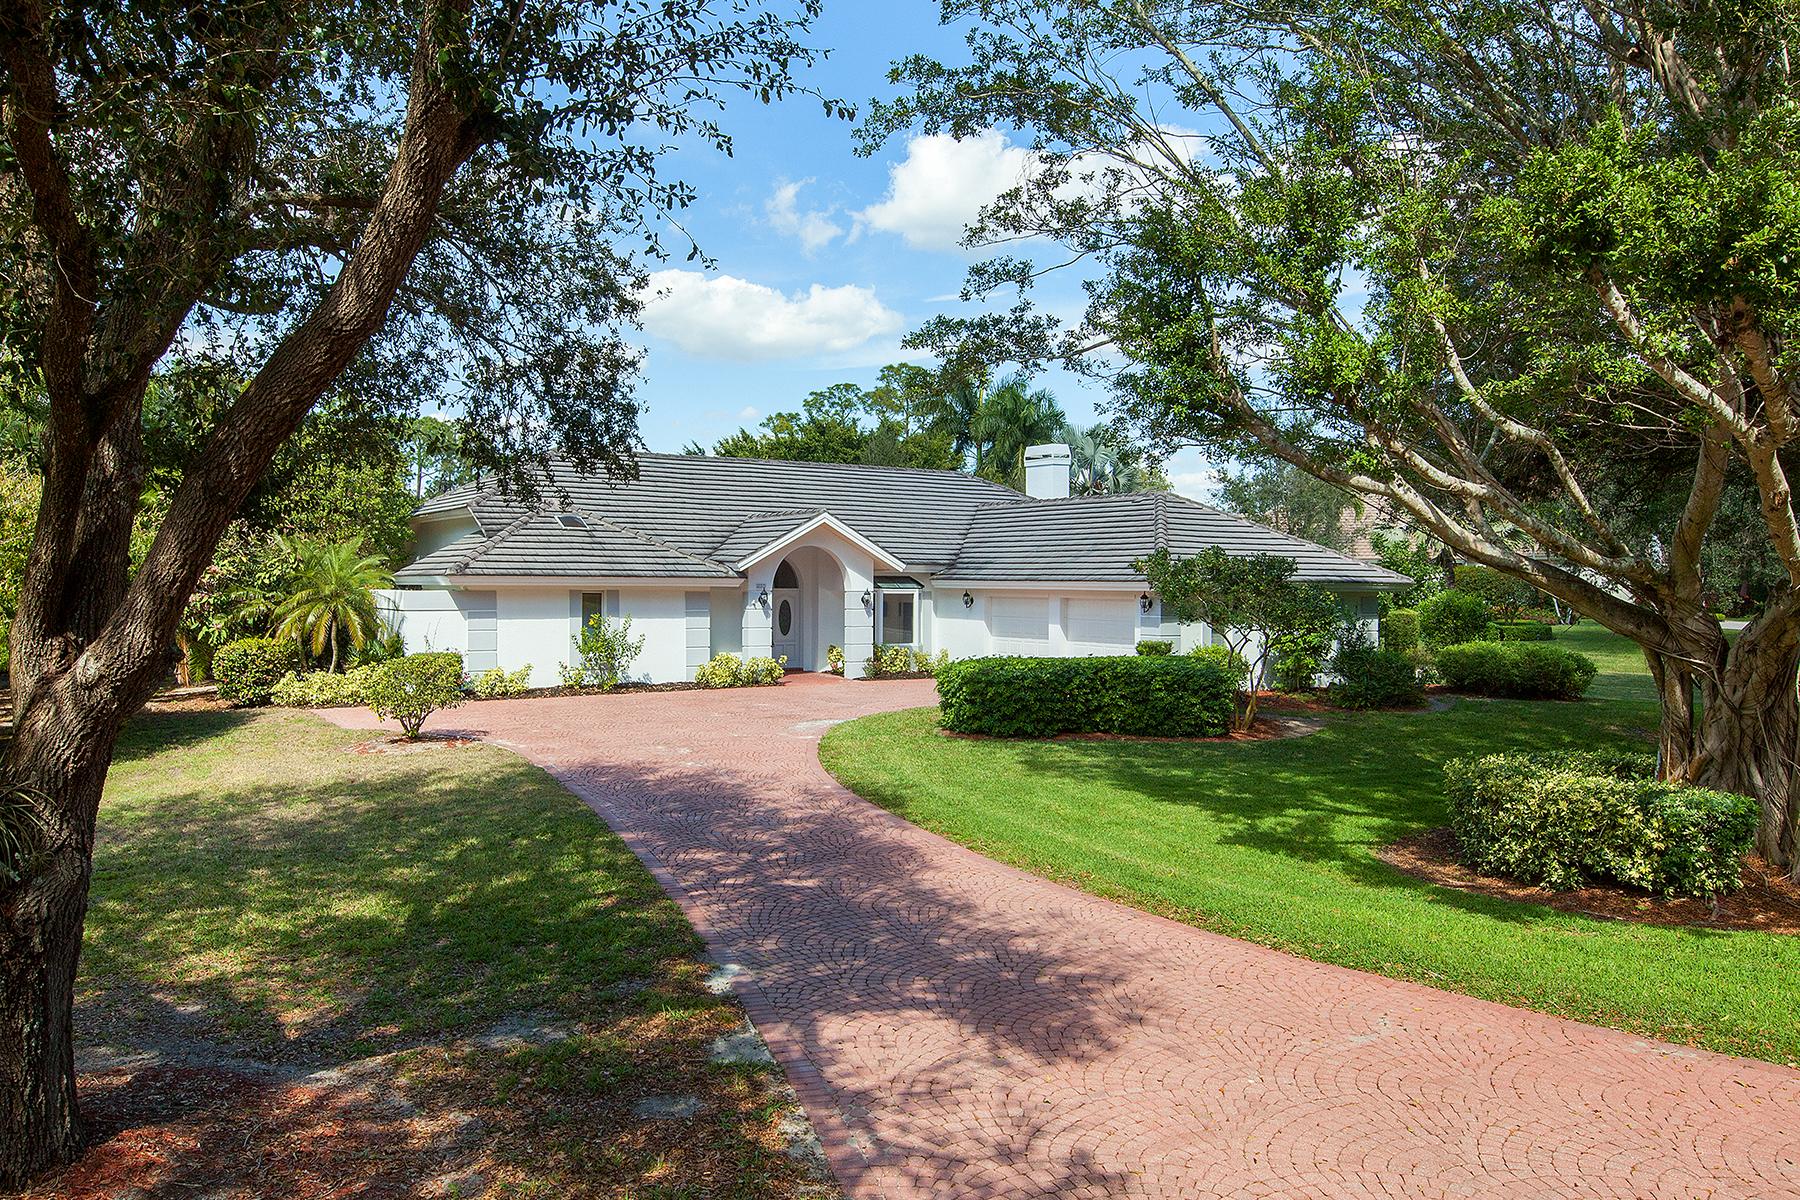 Single Family Home for Sale at NAPLES 4887 Pond Apple Dr S Quail Creek, Naples, Florida, 34119 United States